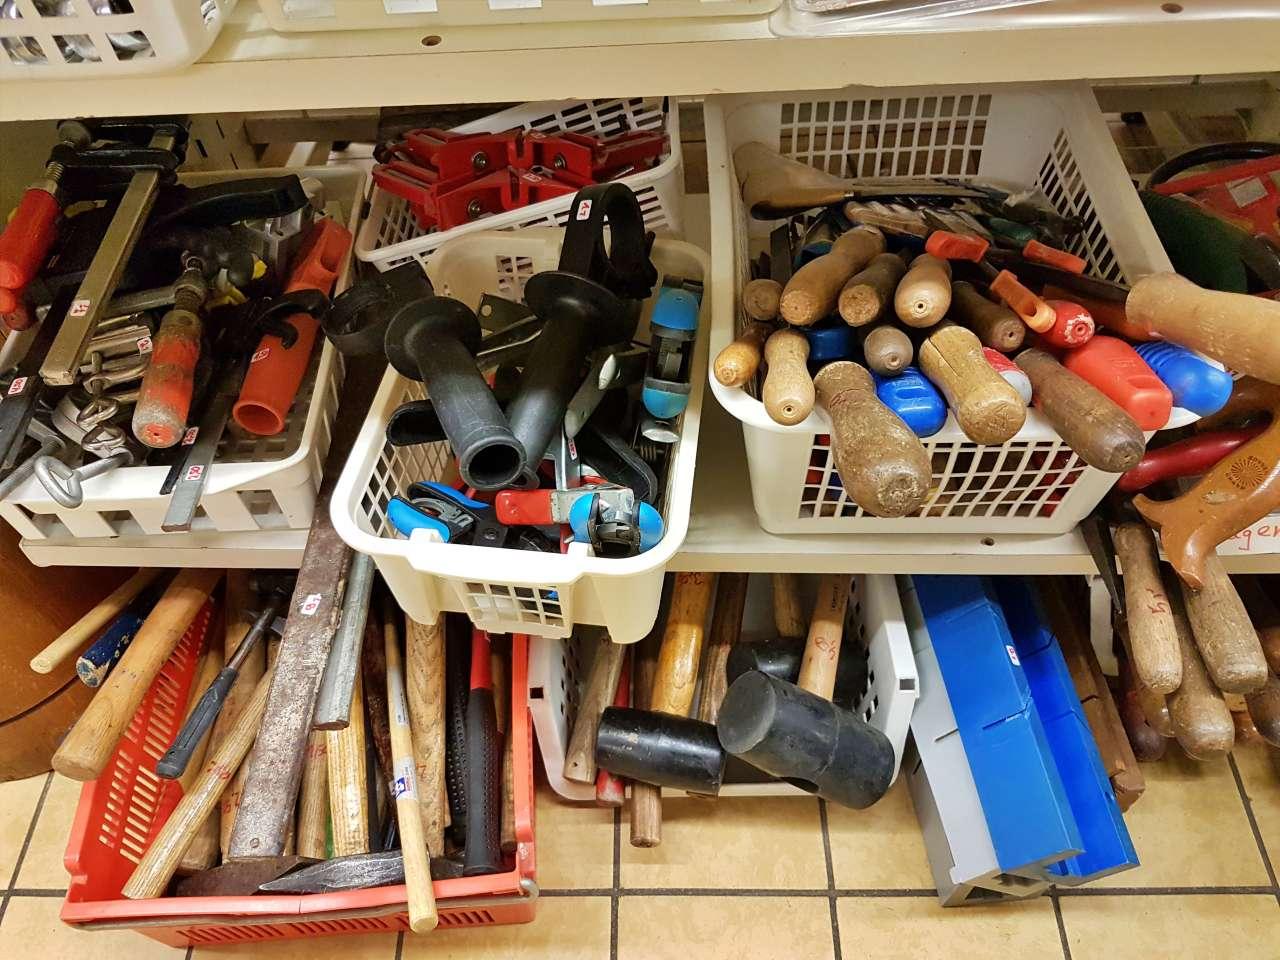 Werkzeuge Hammer Feilen Zwingen große Auswahl